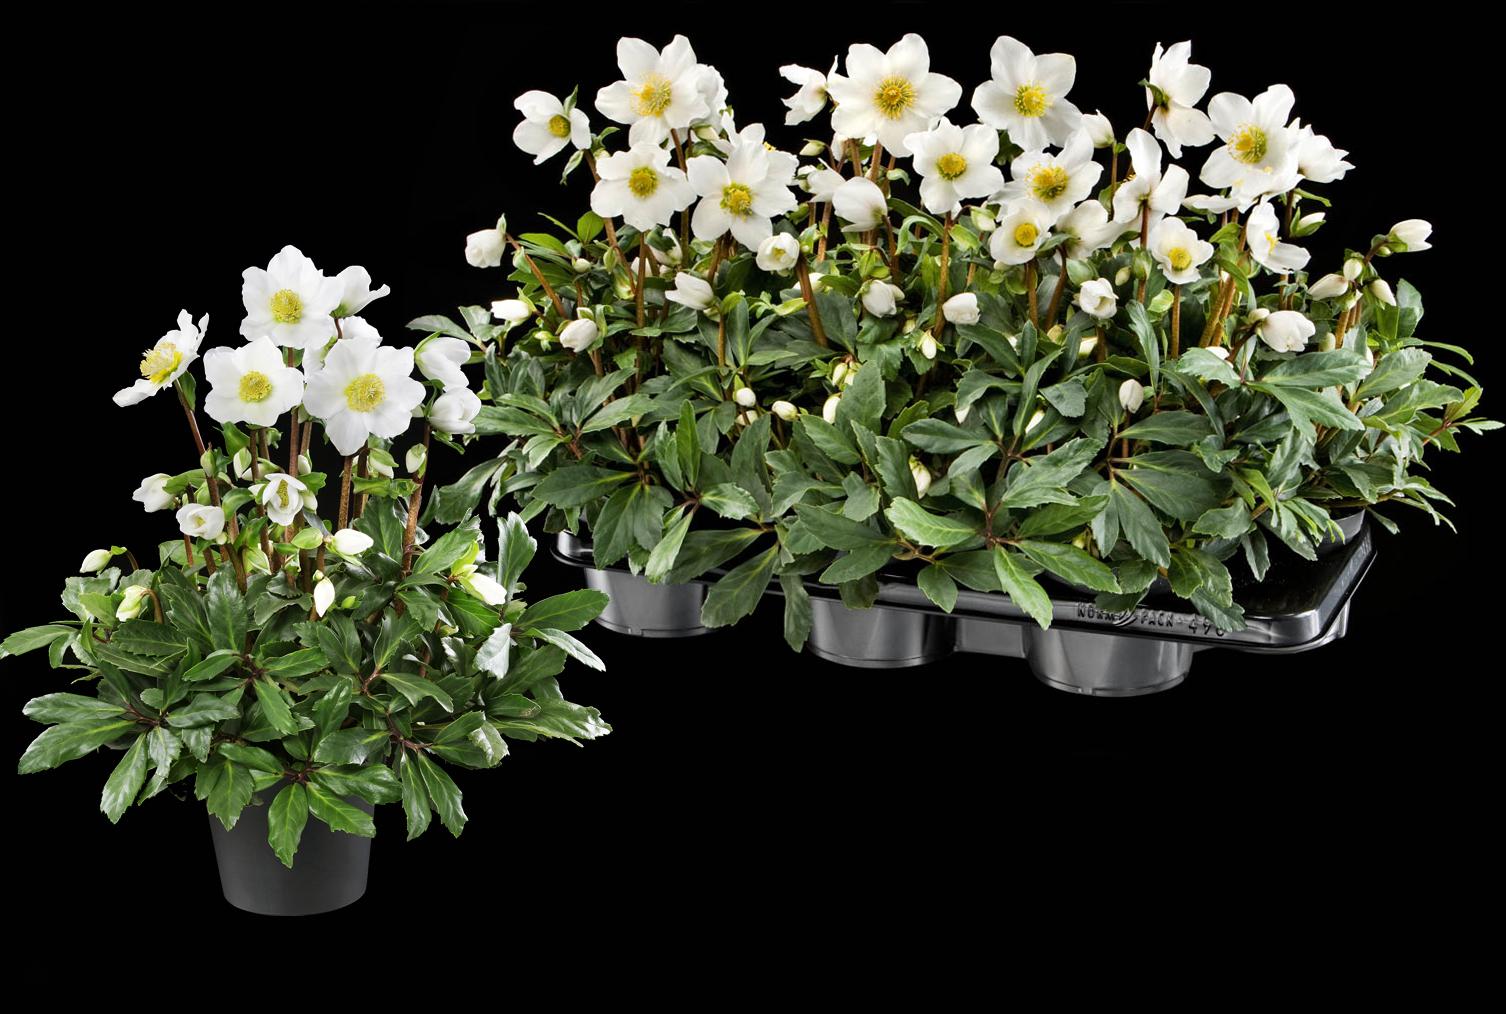 Gartenbaubetriebe  Flowering plants | Heuger Gartenbaubetriebe